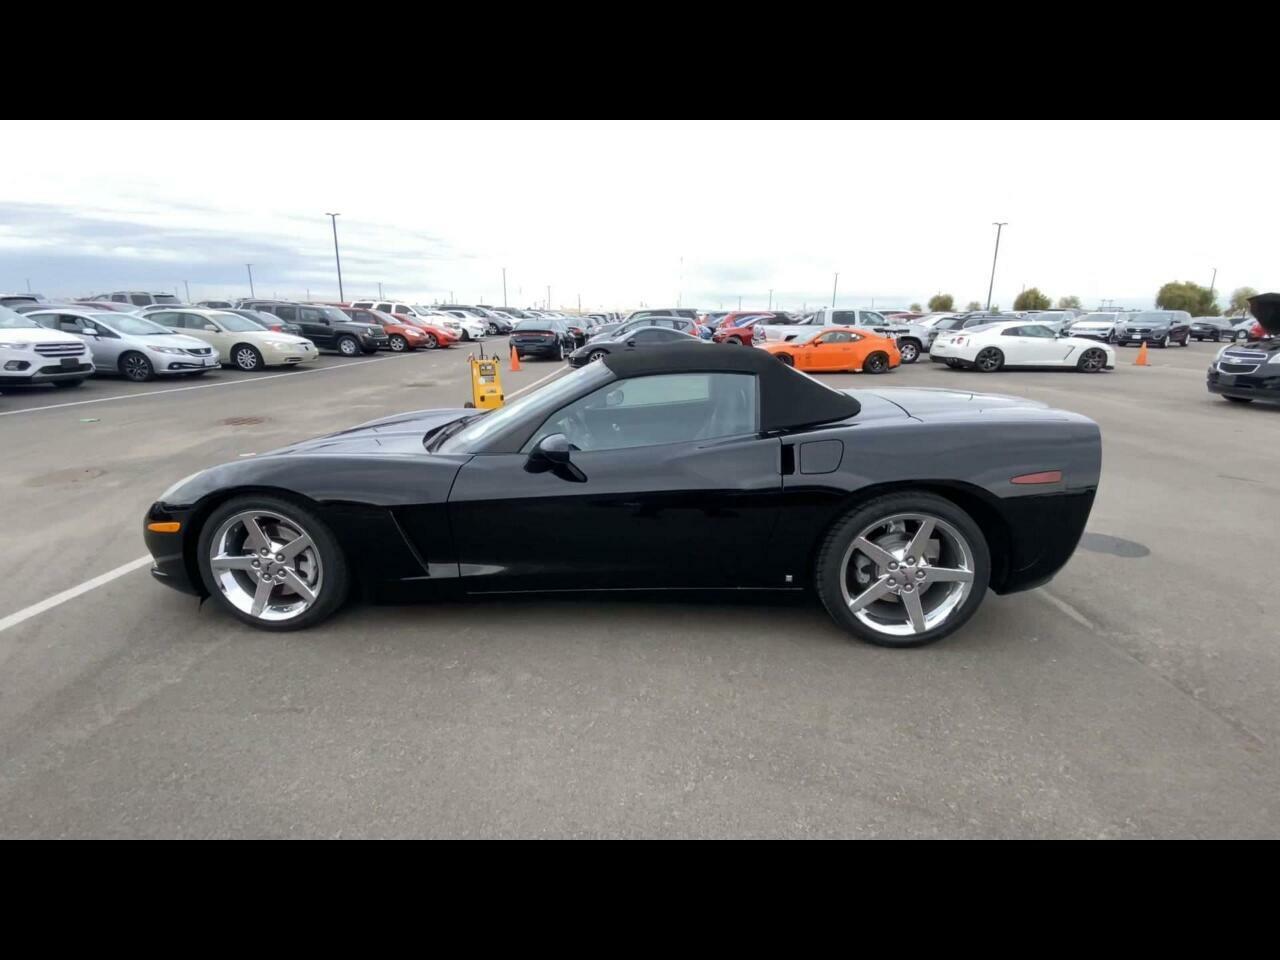 2007 Black Chevrolet Corvette Convertible    C6 Corvette Photo 1